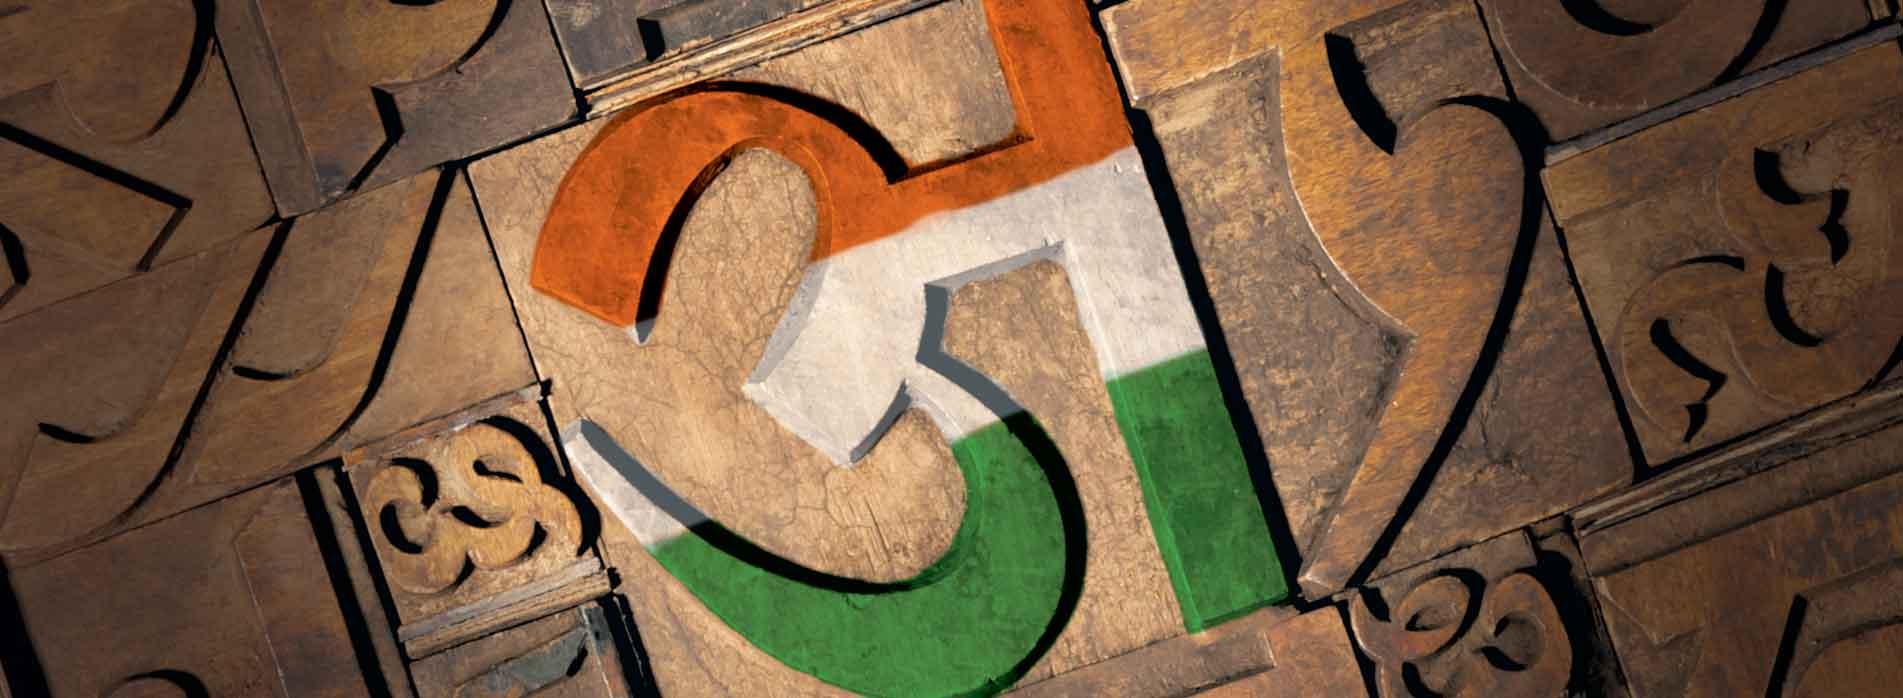 Why Hindi isn't the national language